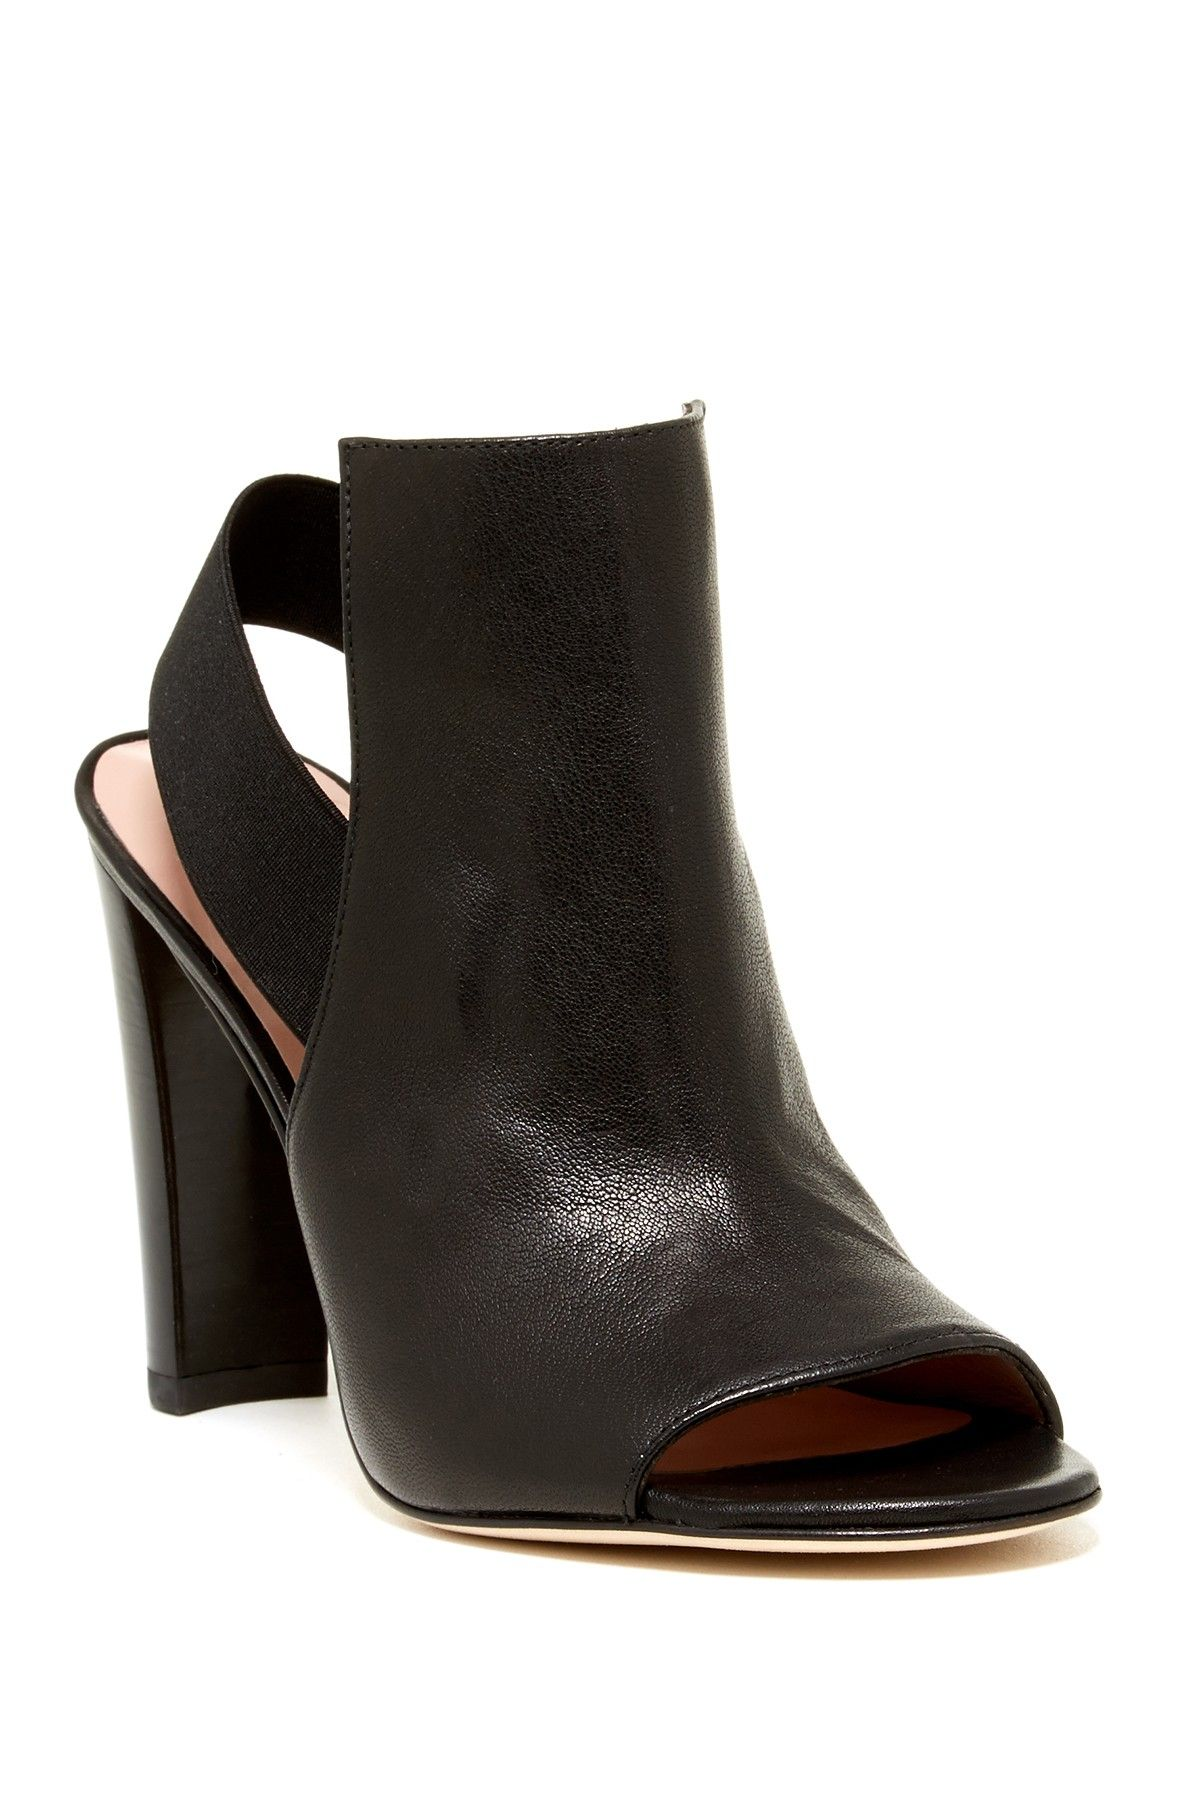 b968fb0e3ef Fronton High Heeled Shoe